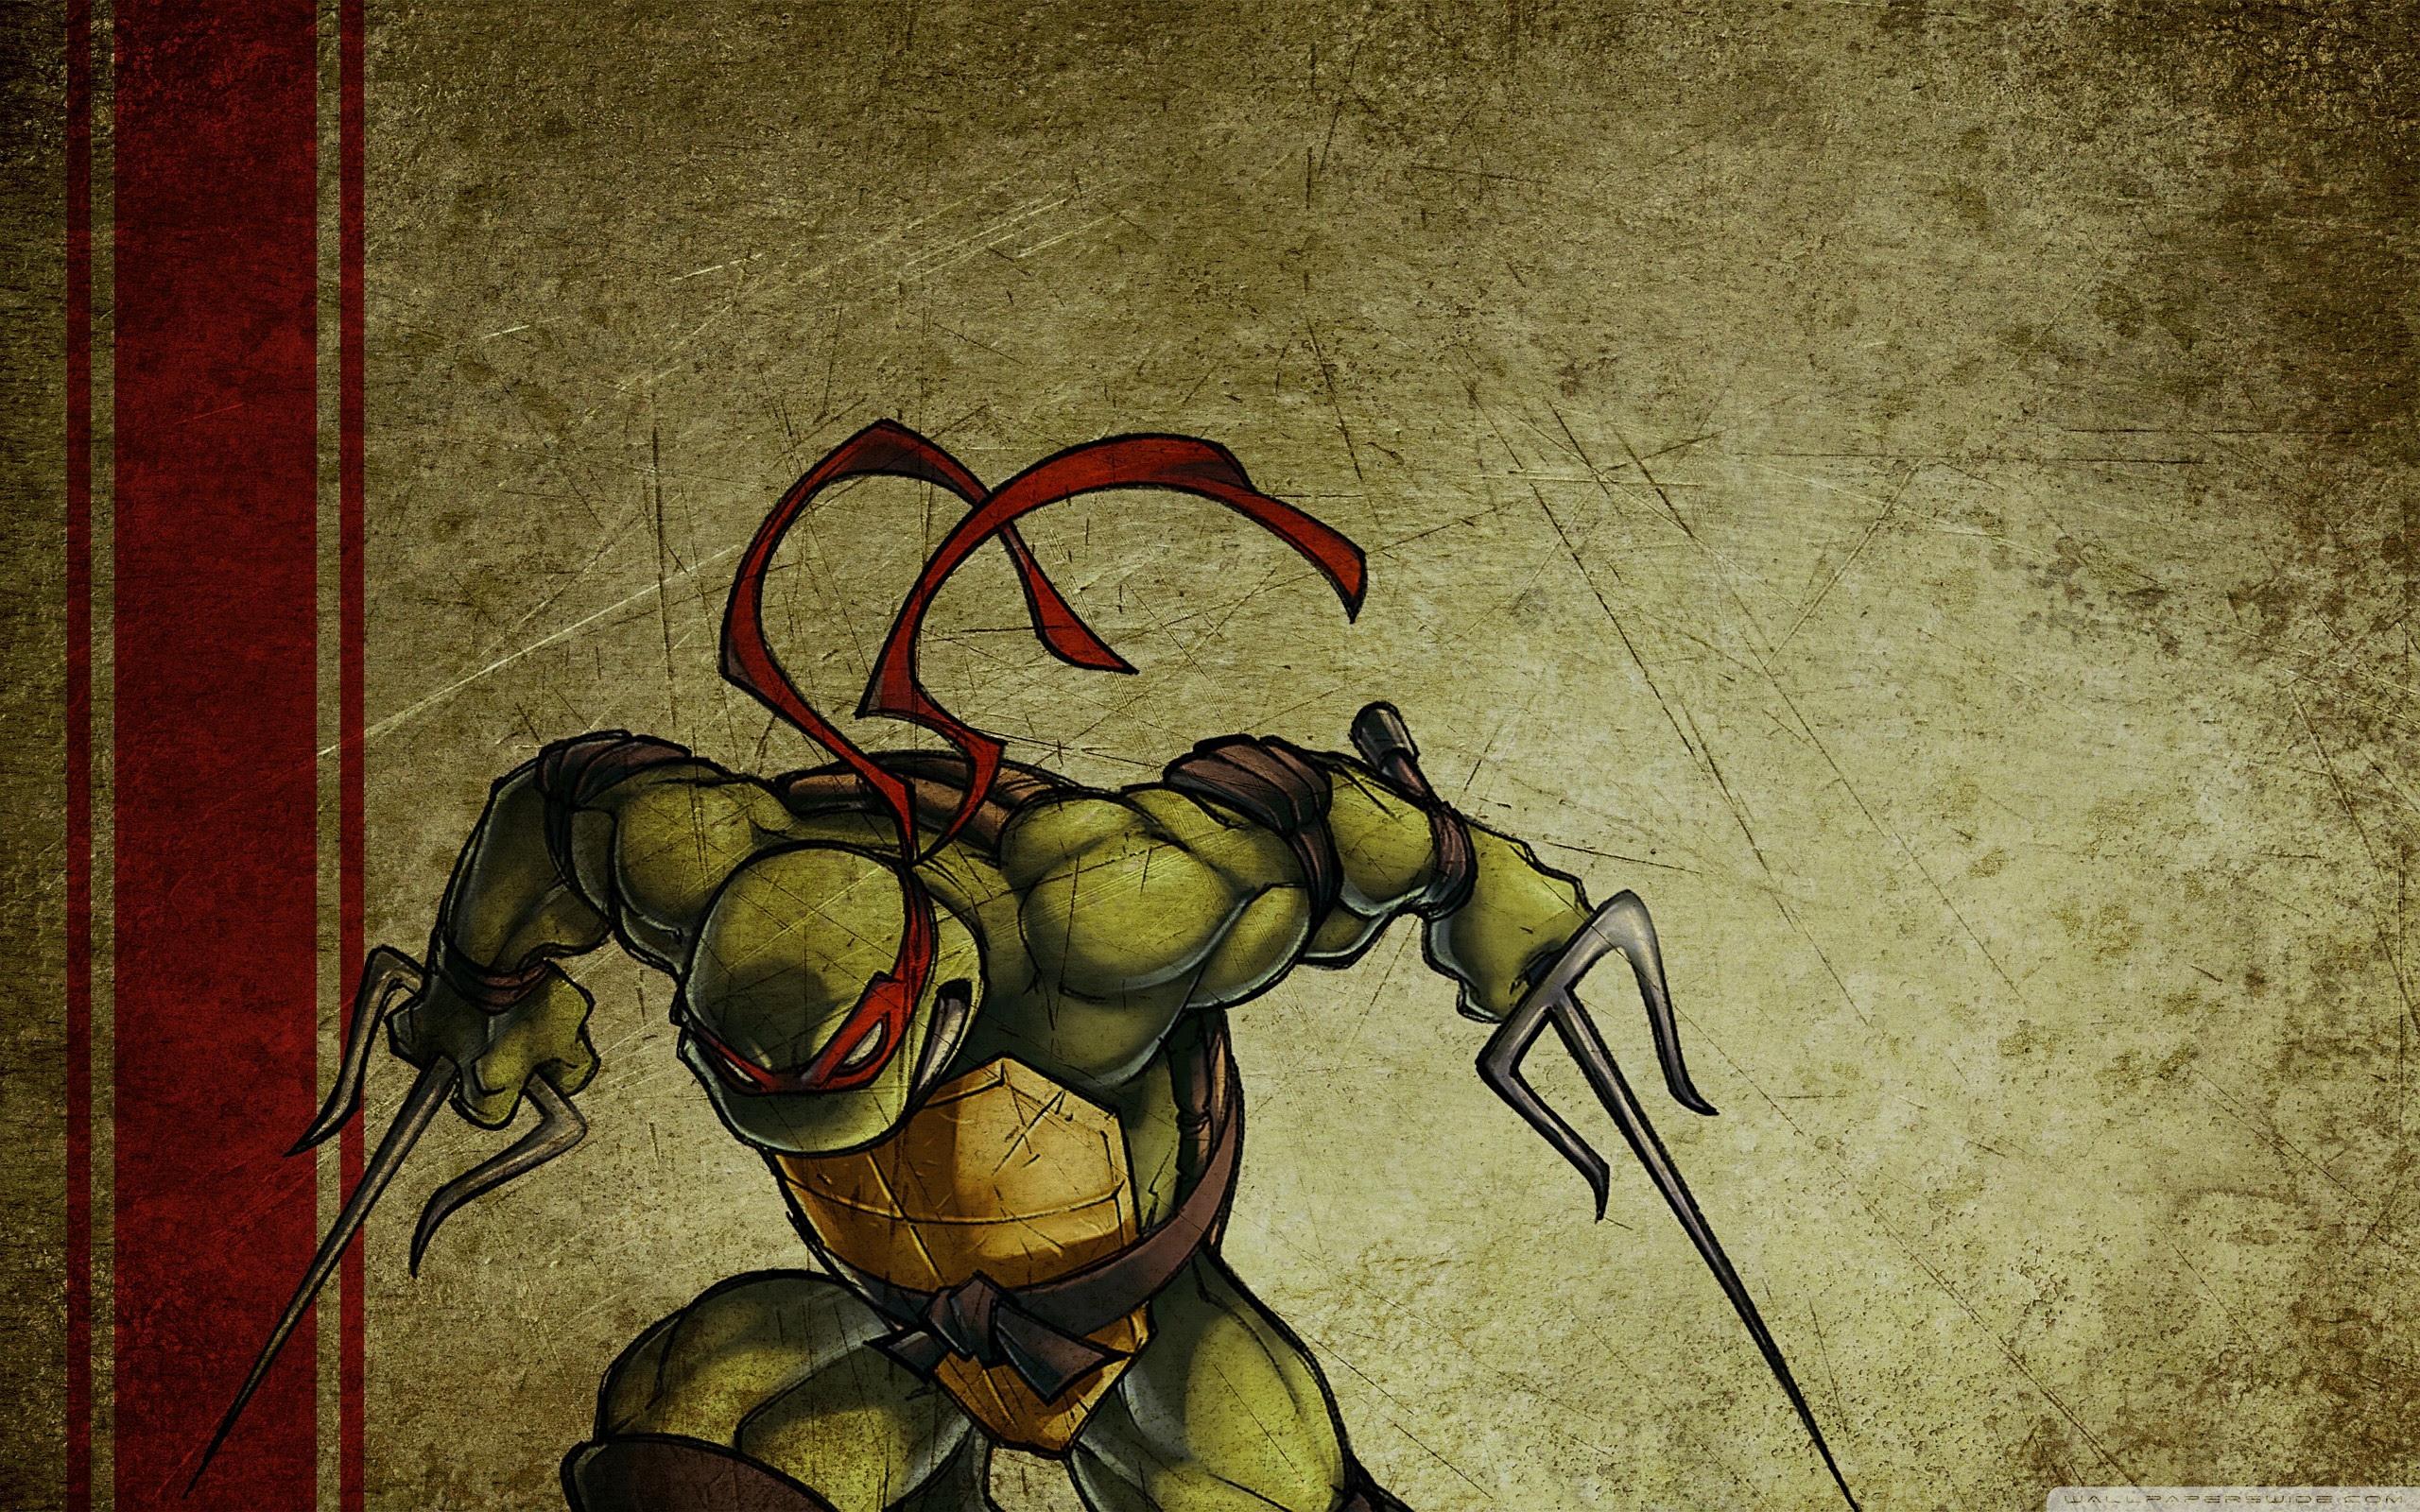 Teenage Mutant Ninja Turtles Wallpaper 2560x1600 76346